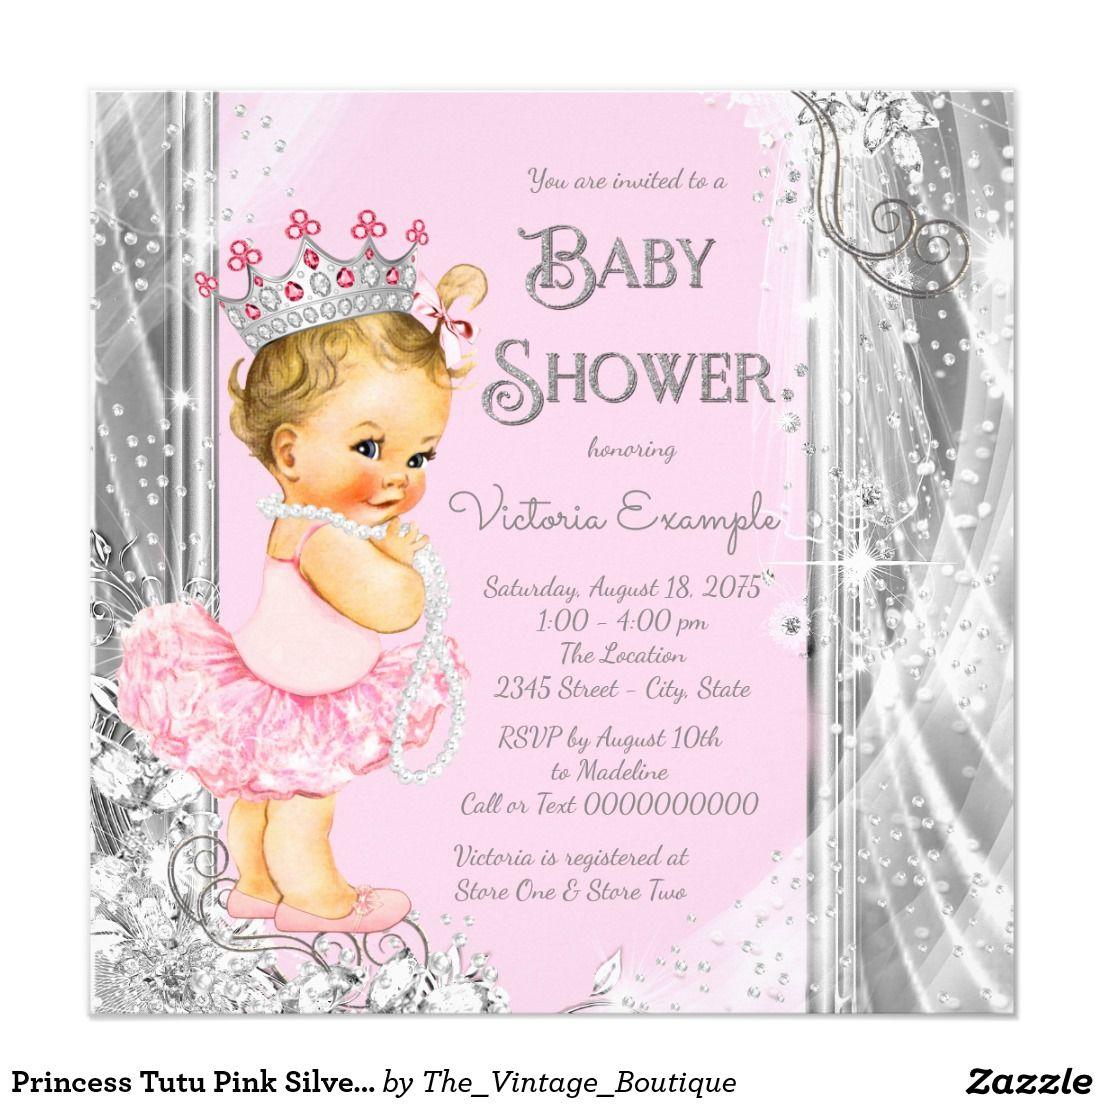 Princess Tutu Pink Silver Baby Shower Card   Princess tutu and Tutu